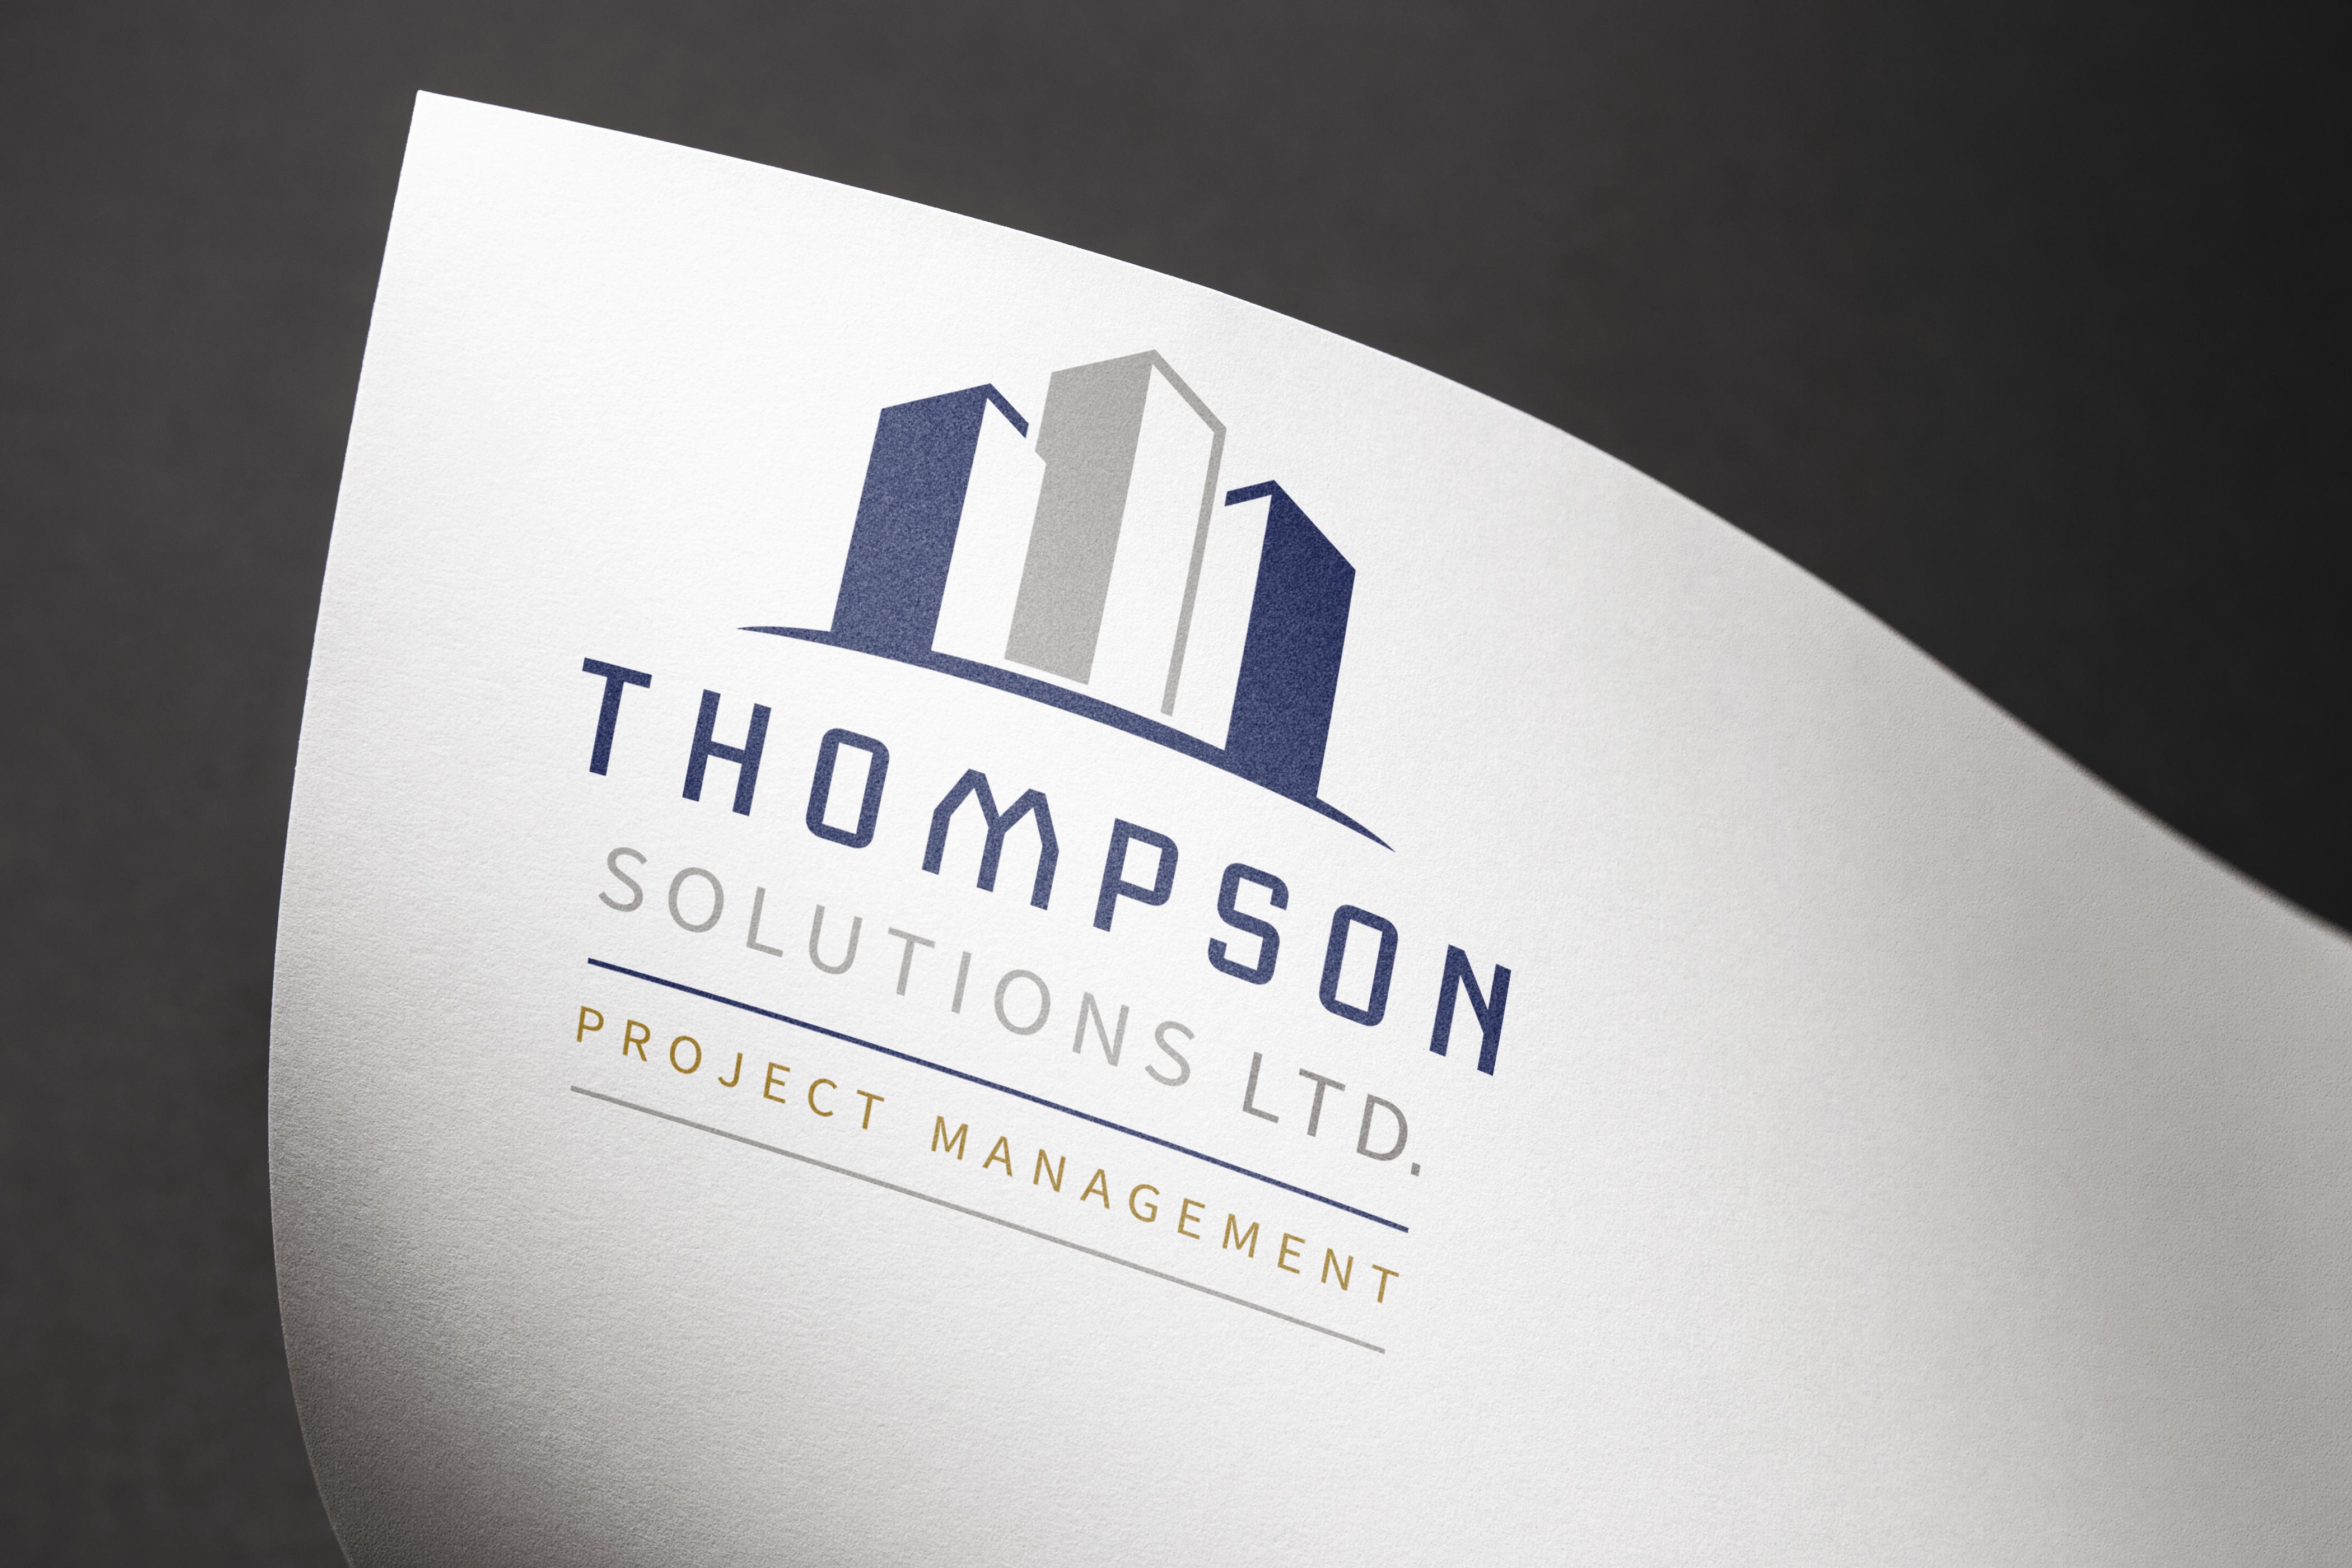 Thompson Solutions